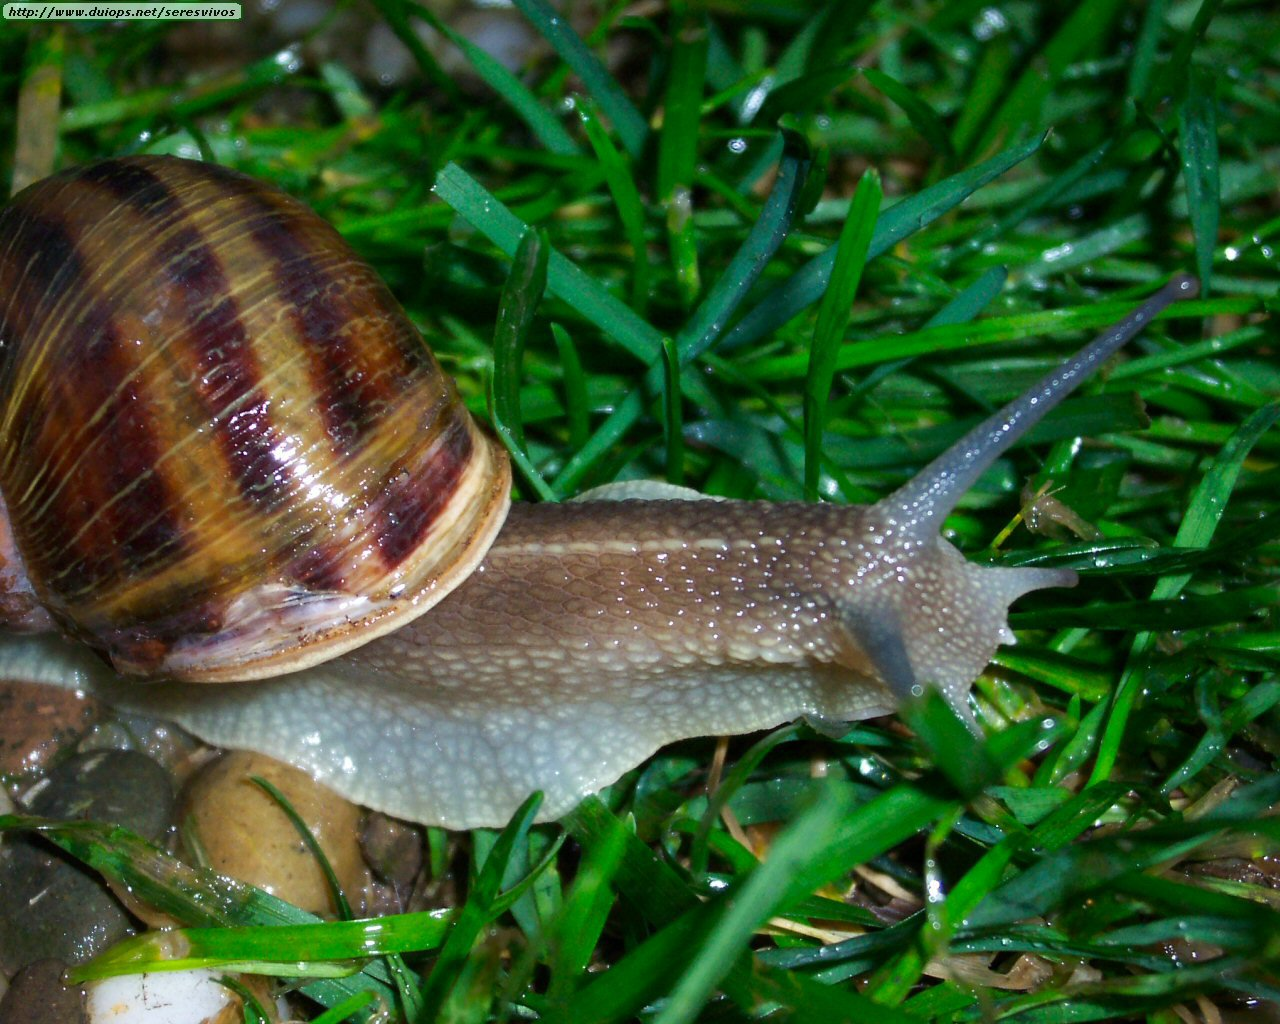 Fotos de moluscos for Caracol de jardin